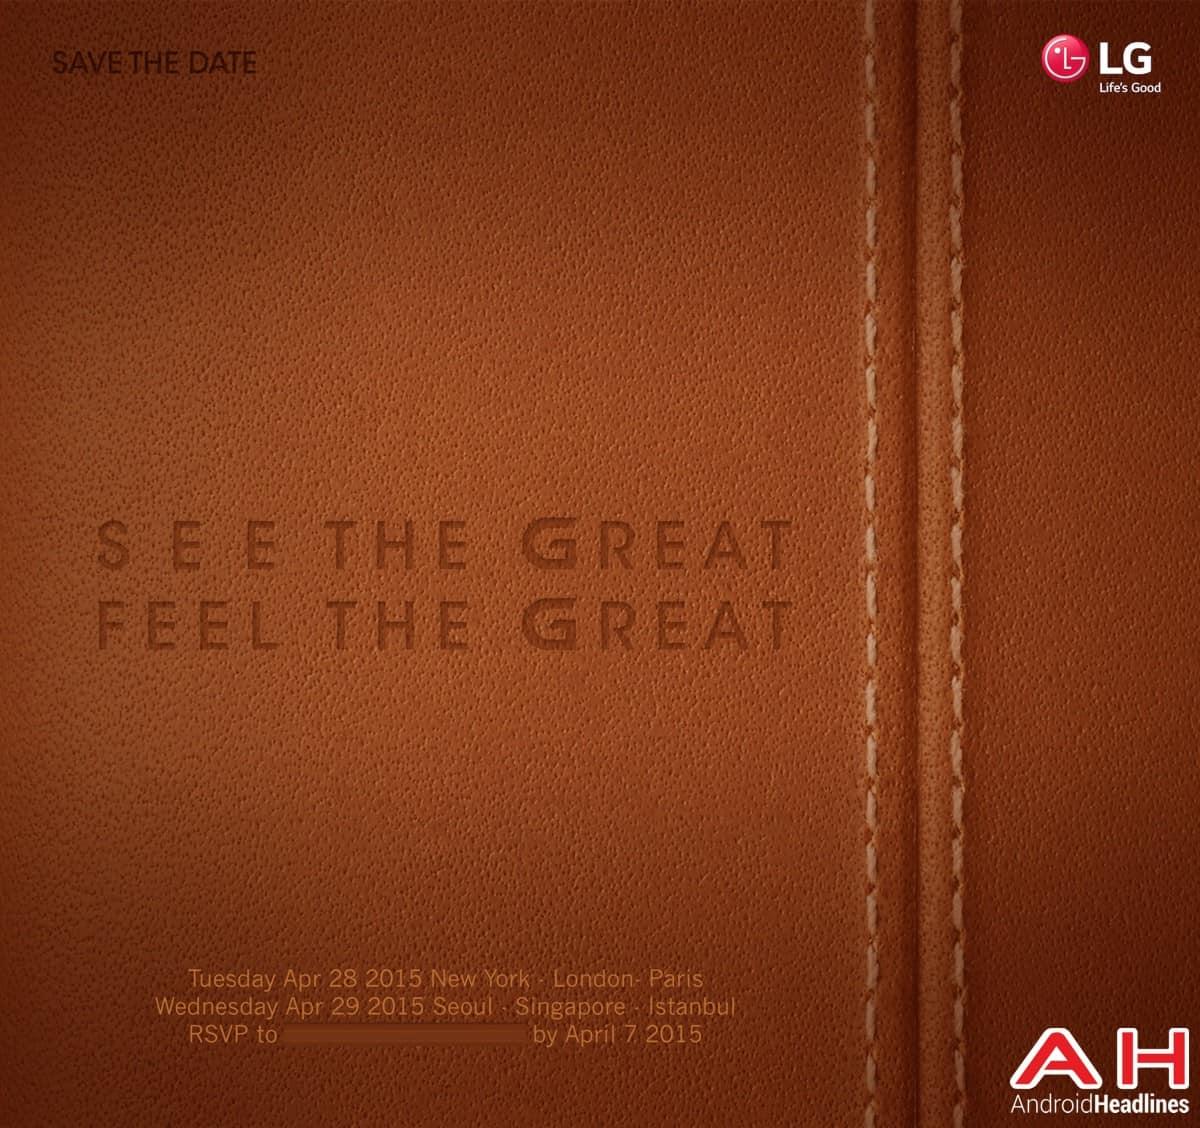 LG G4 Event Invite